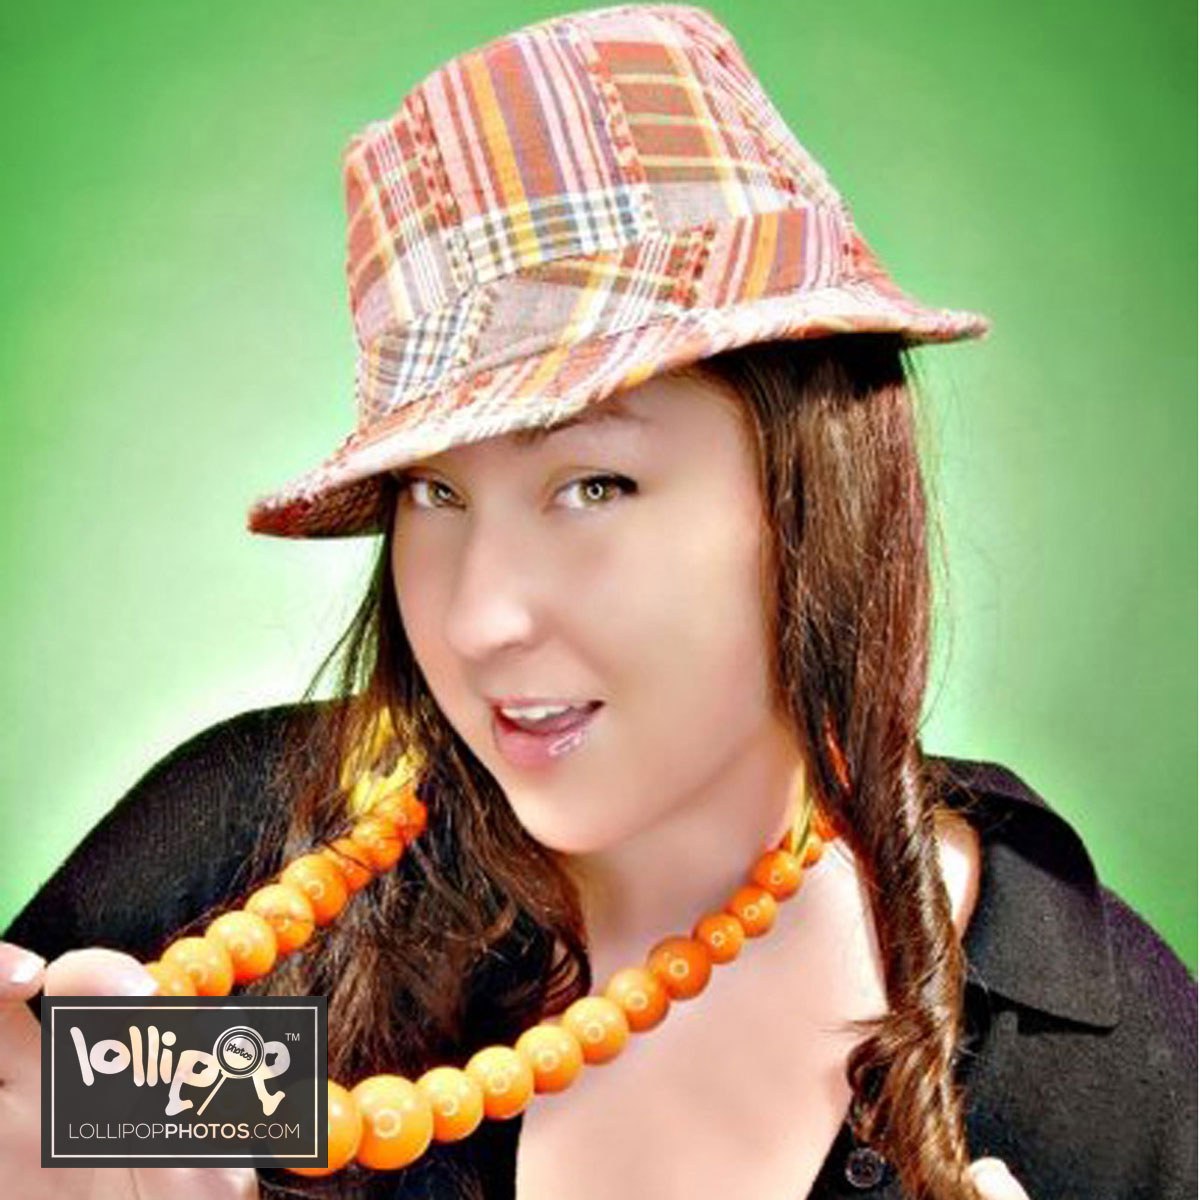 msdig-nora-canfield-lollipop-photos-162.jpg